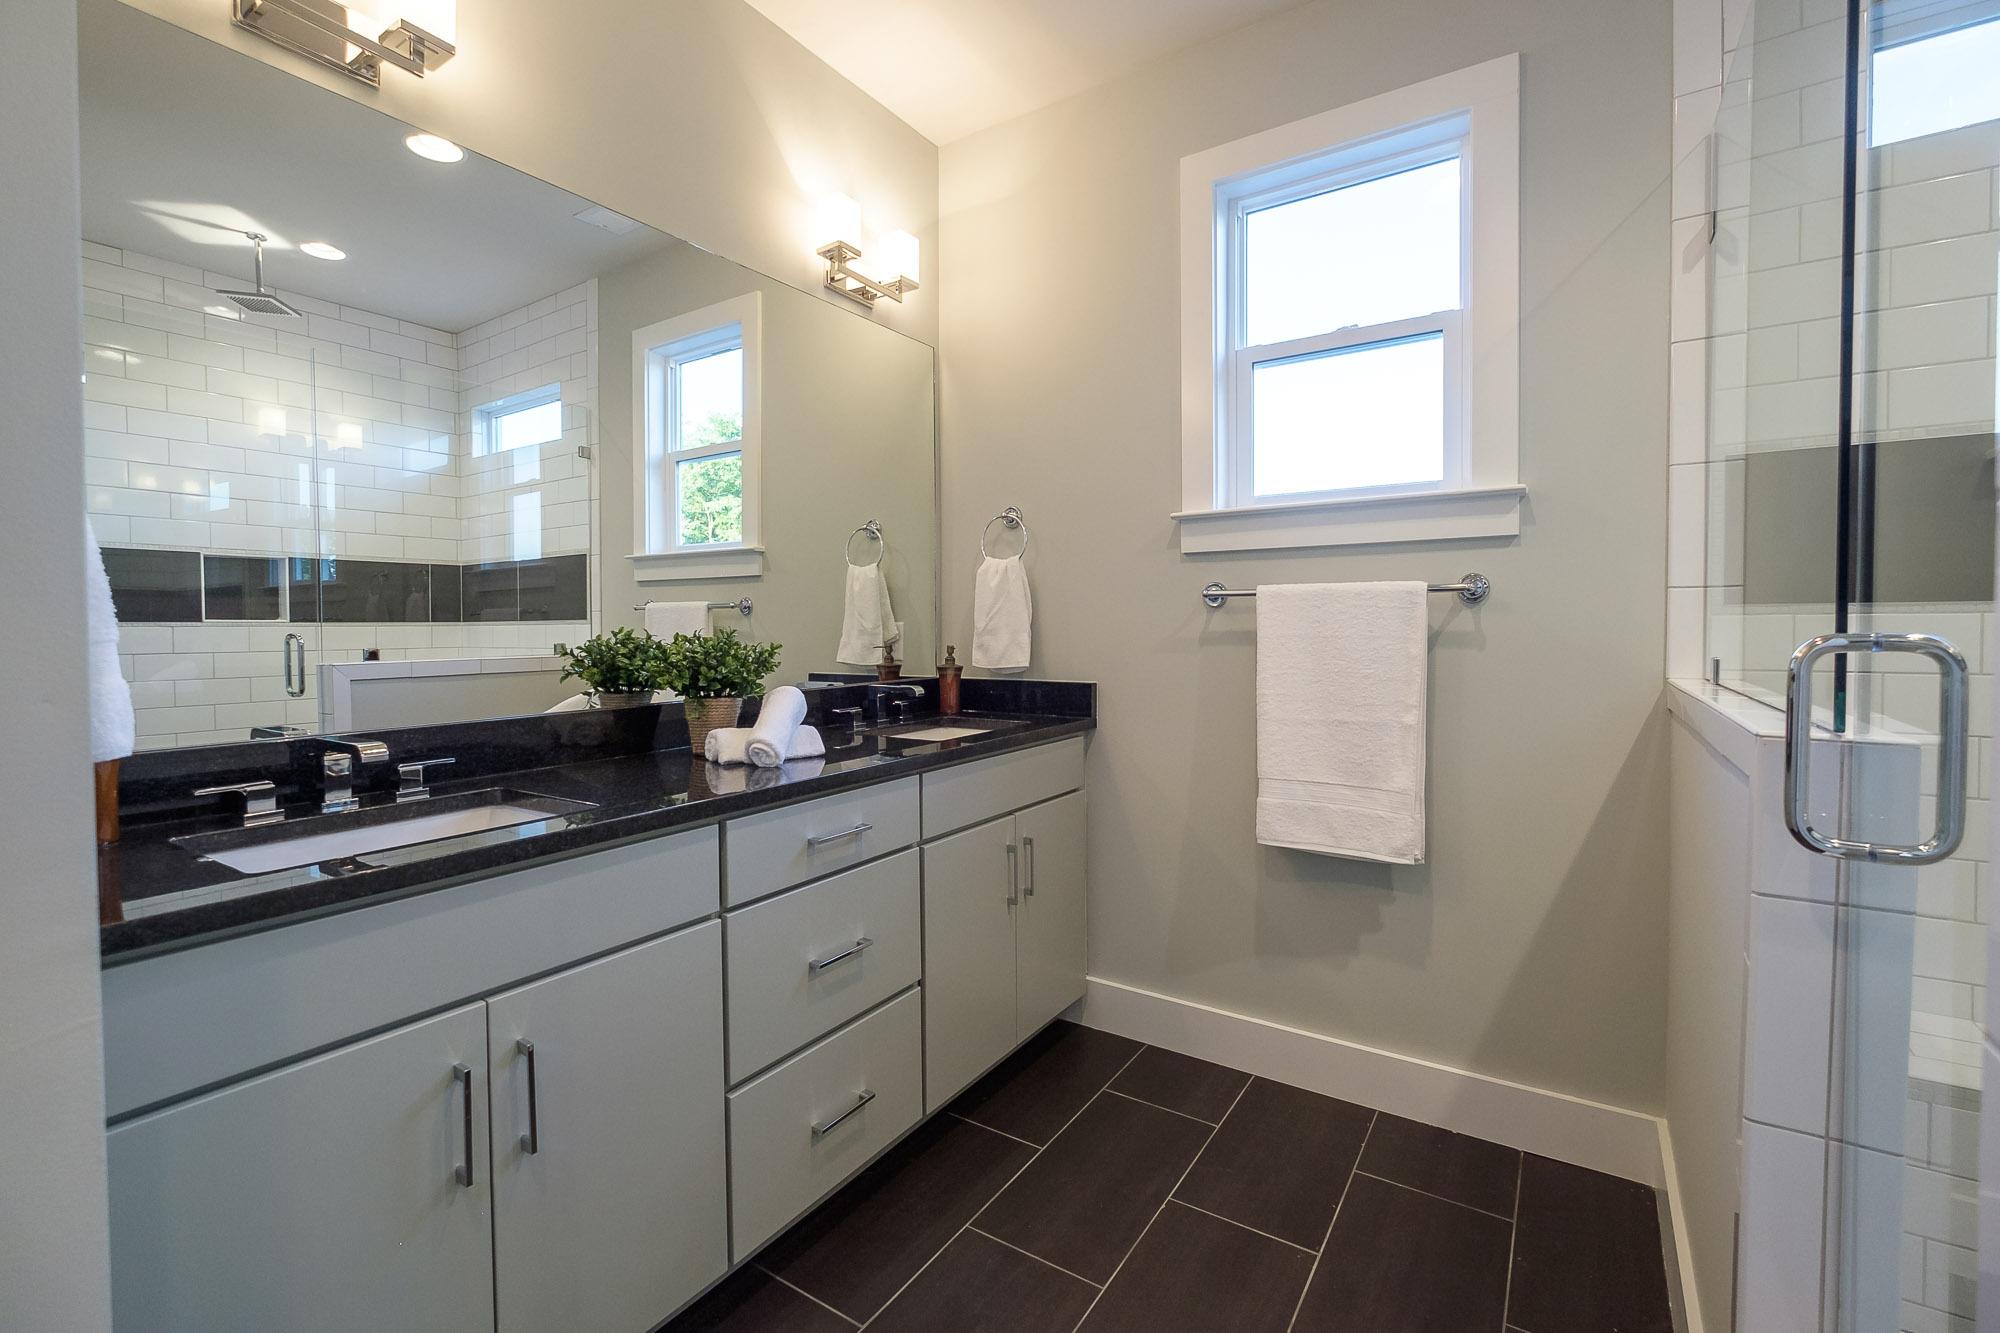 House-Plans-Online-Duplex-Nashville-Peggy-Newman-Master Bath-Porter.jpg